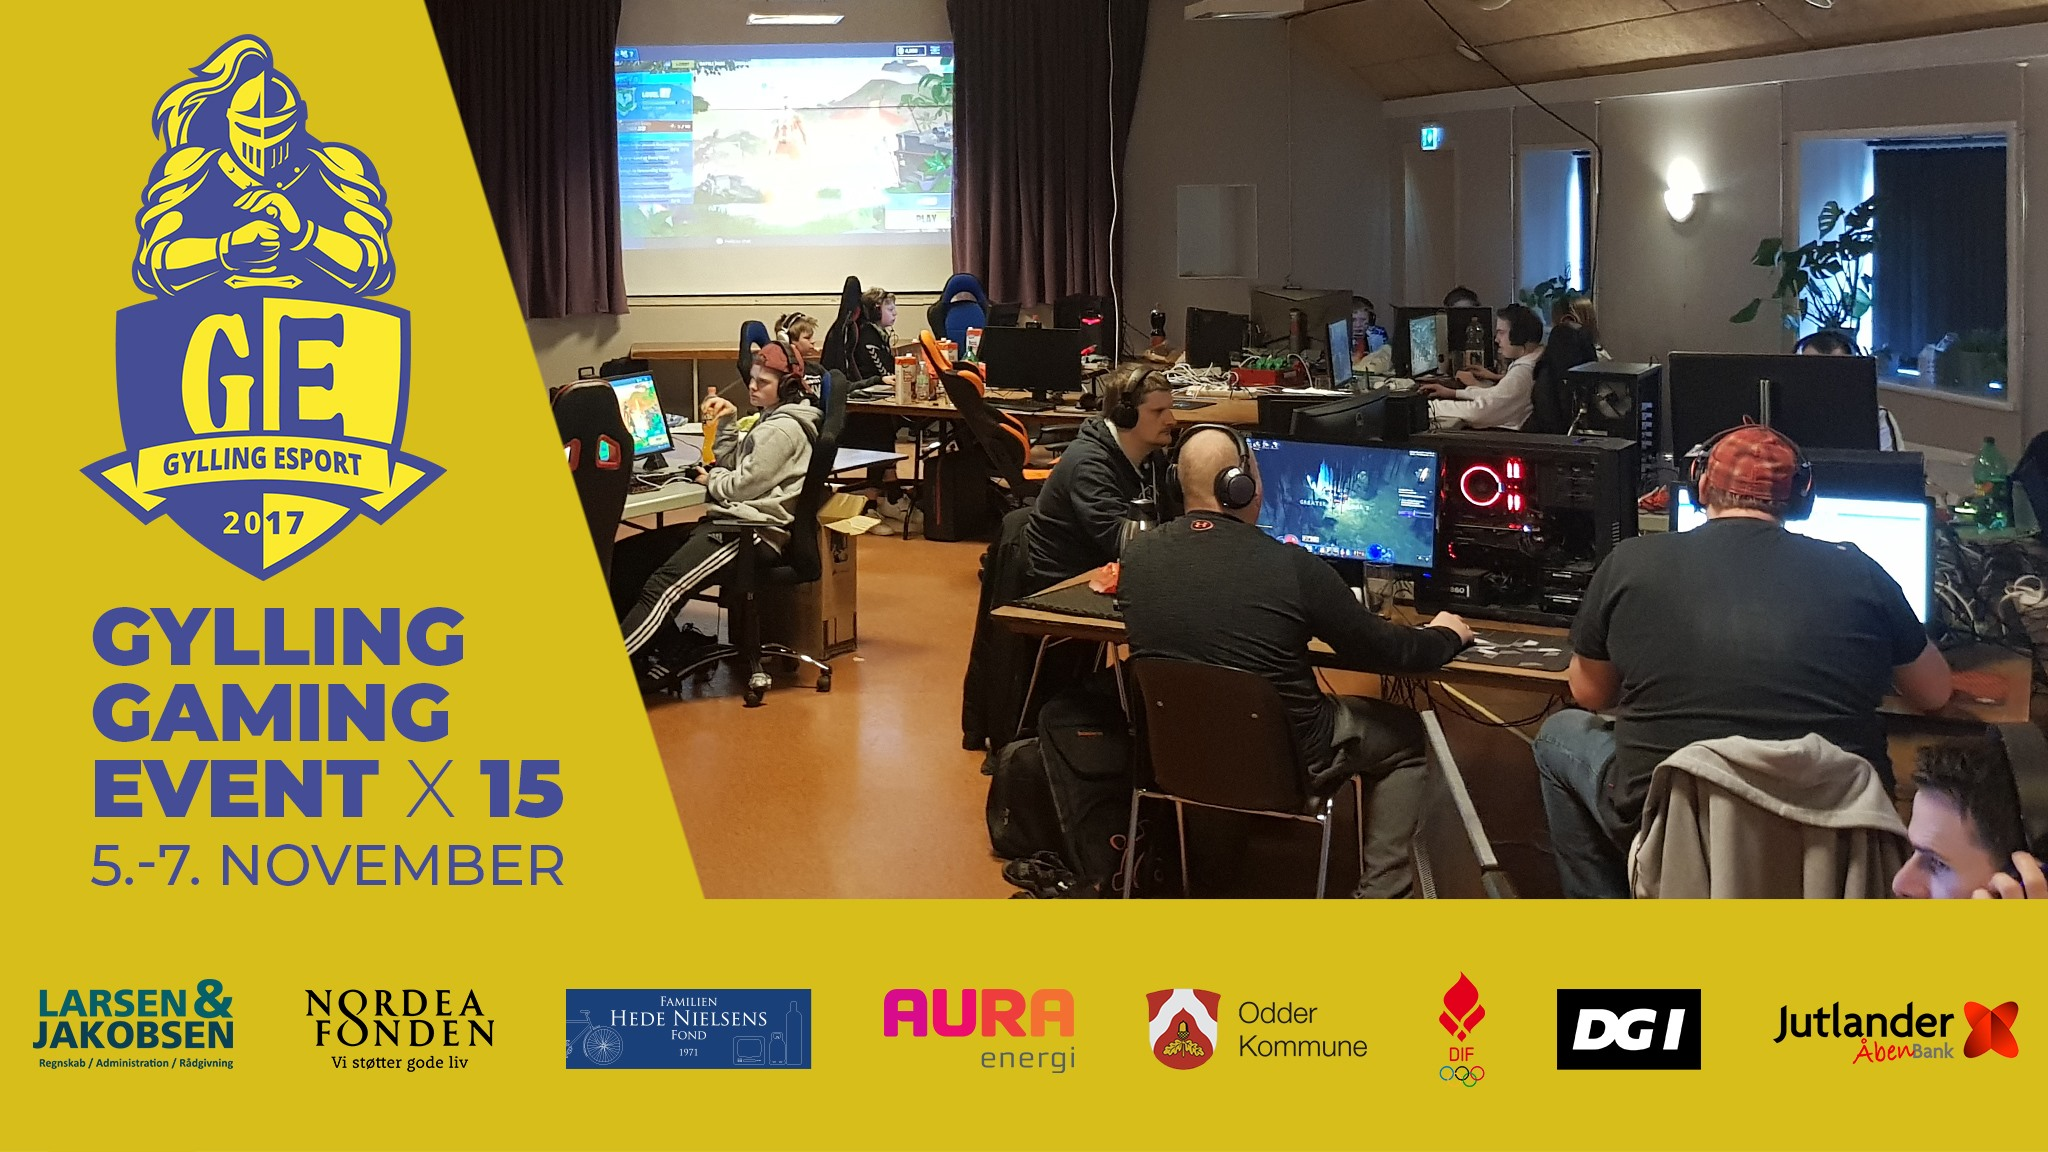 Gylling Gaming Event